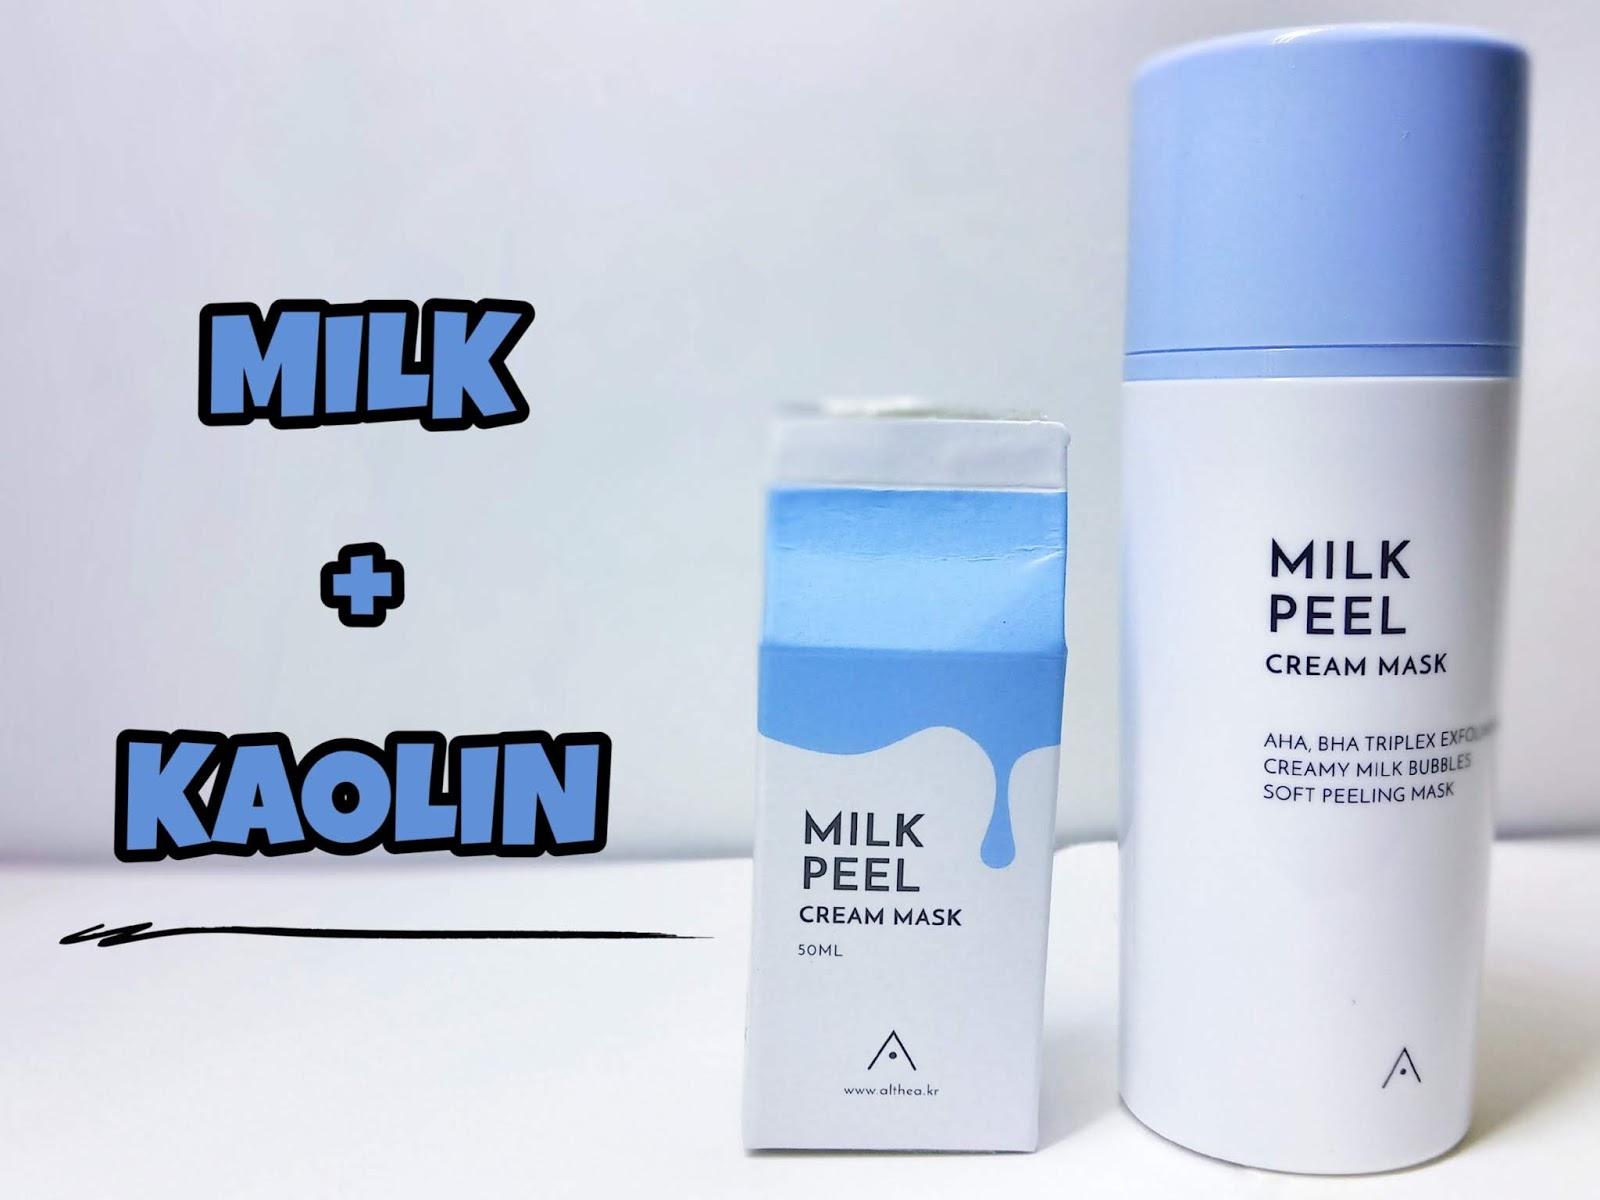 Susu Milk Peel Cream Mask Althea